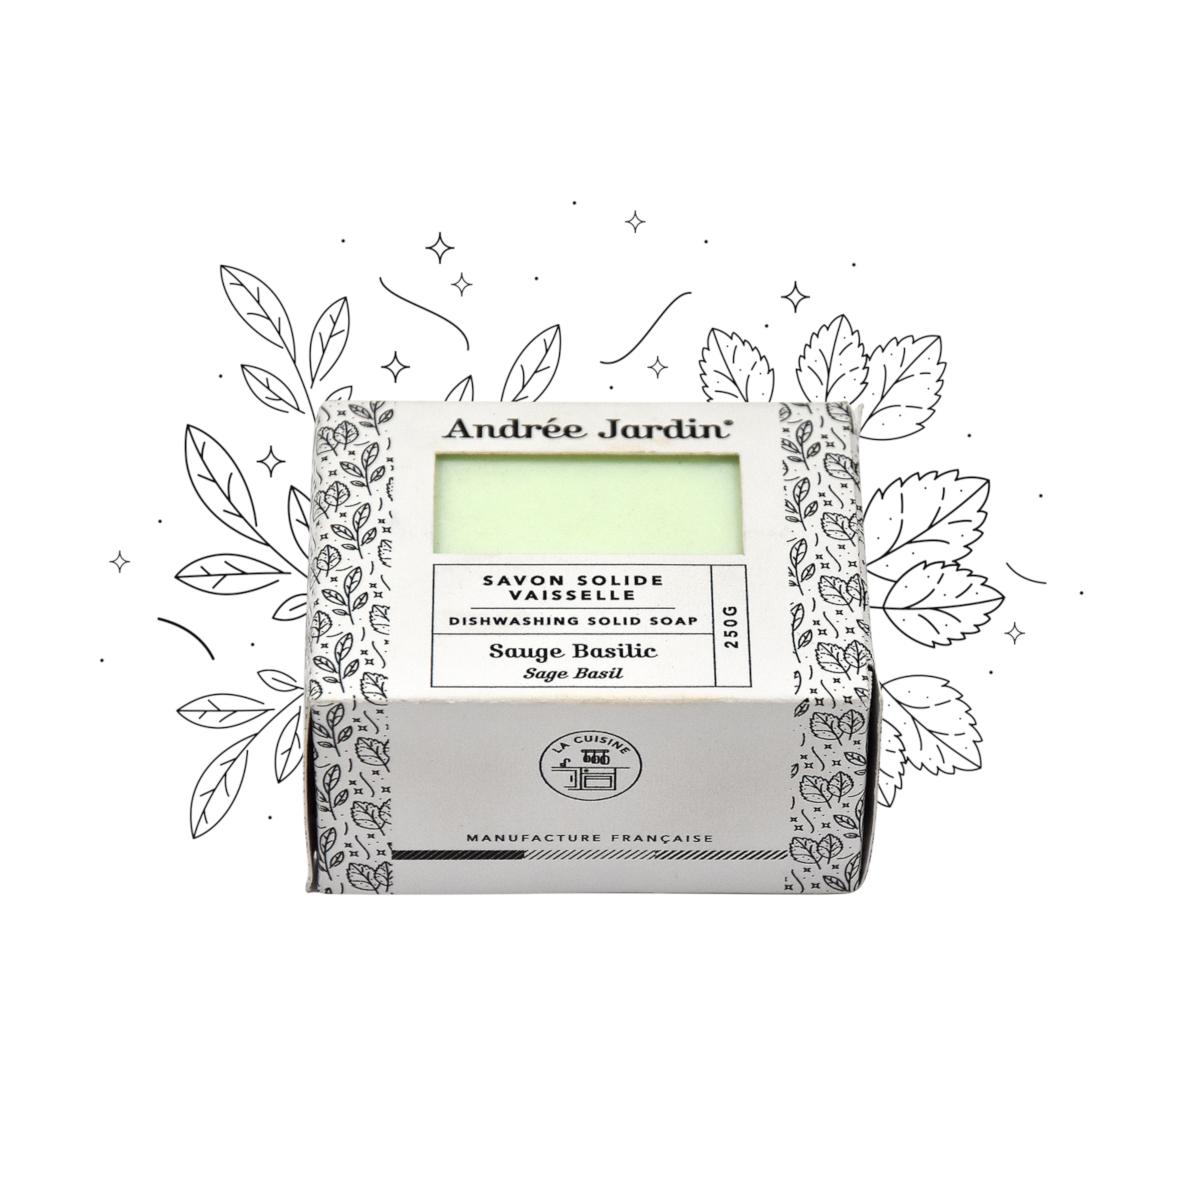 Naturalne mydło w kostce Mint/lemon Andree Jardin